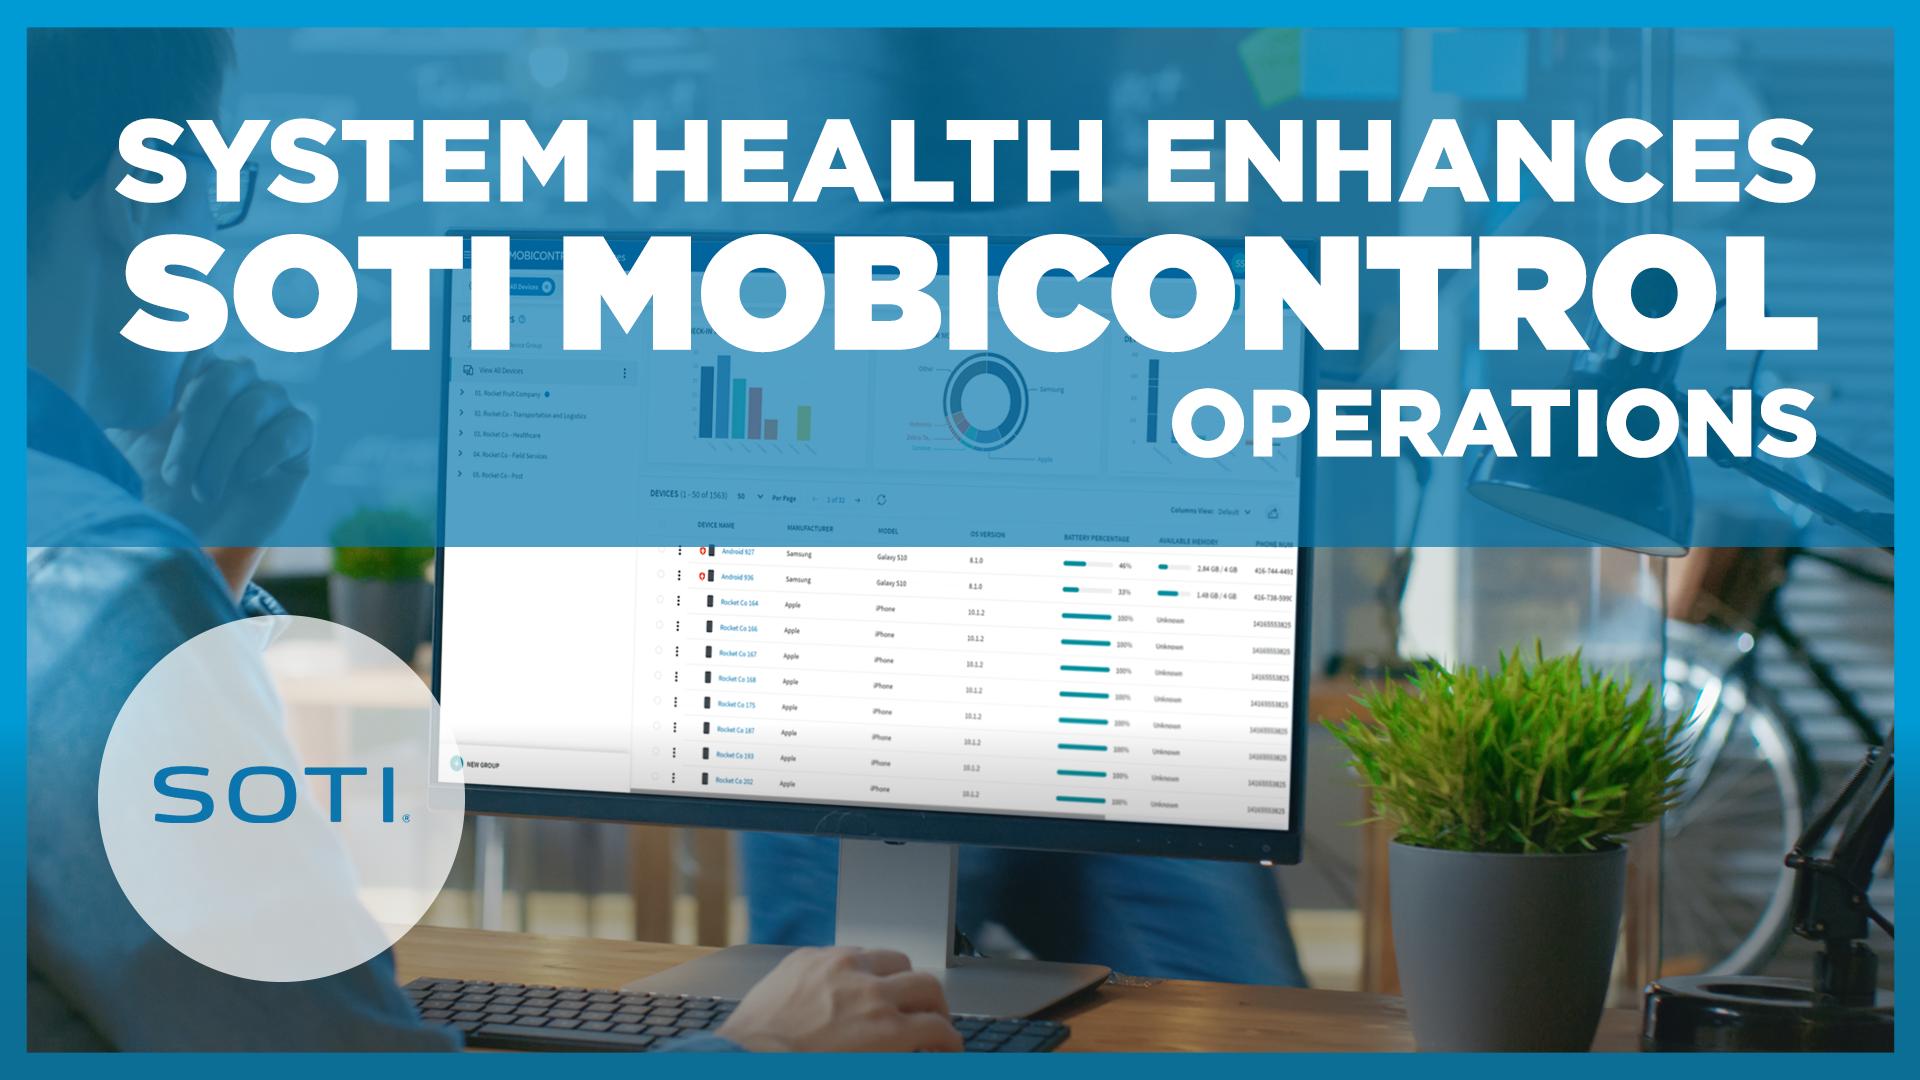 System Health Enhances SOTI MobiControl Operations